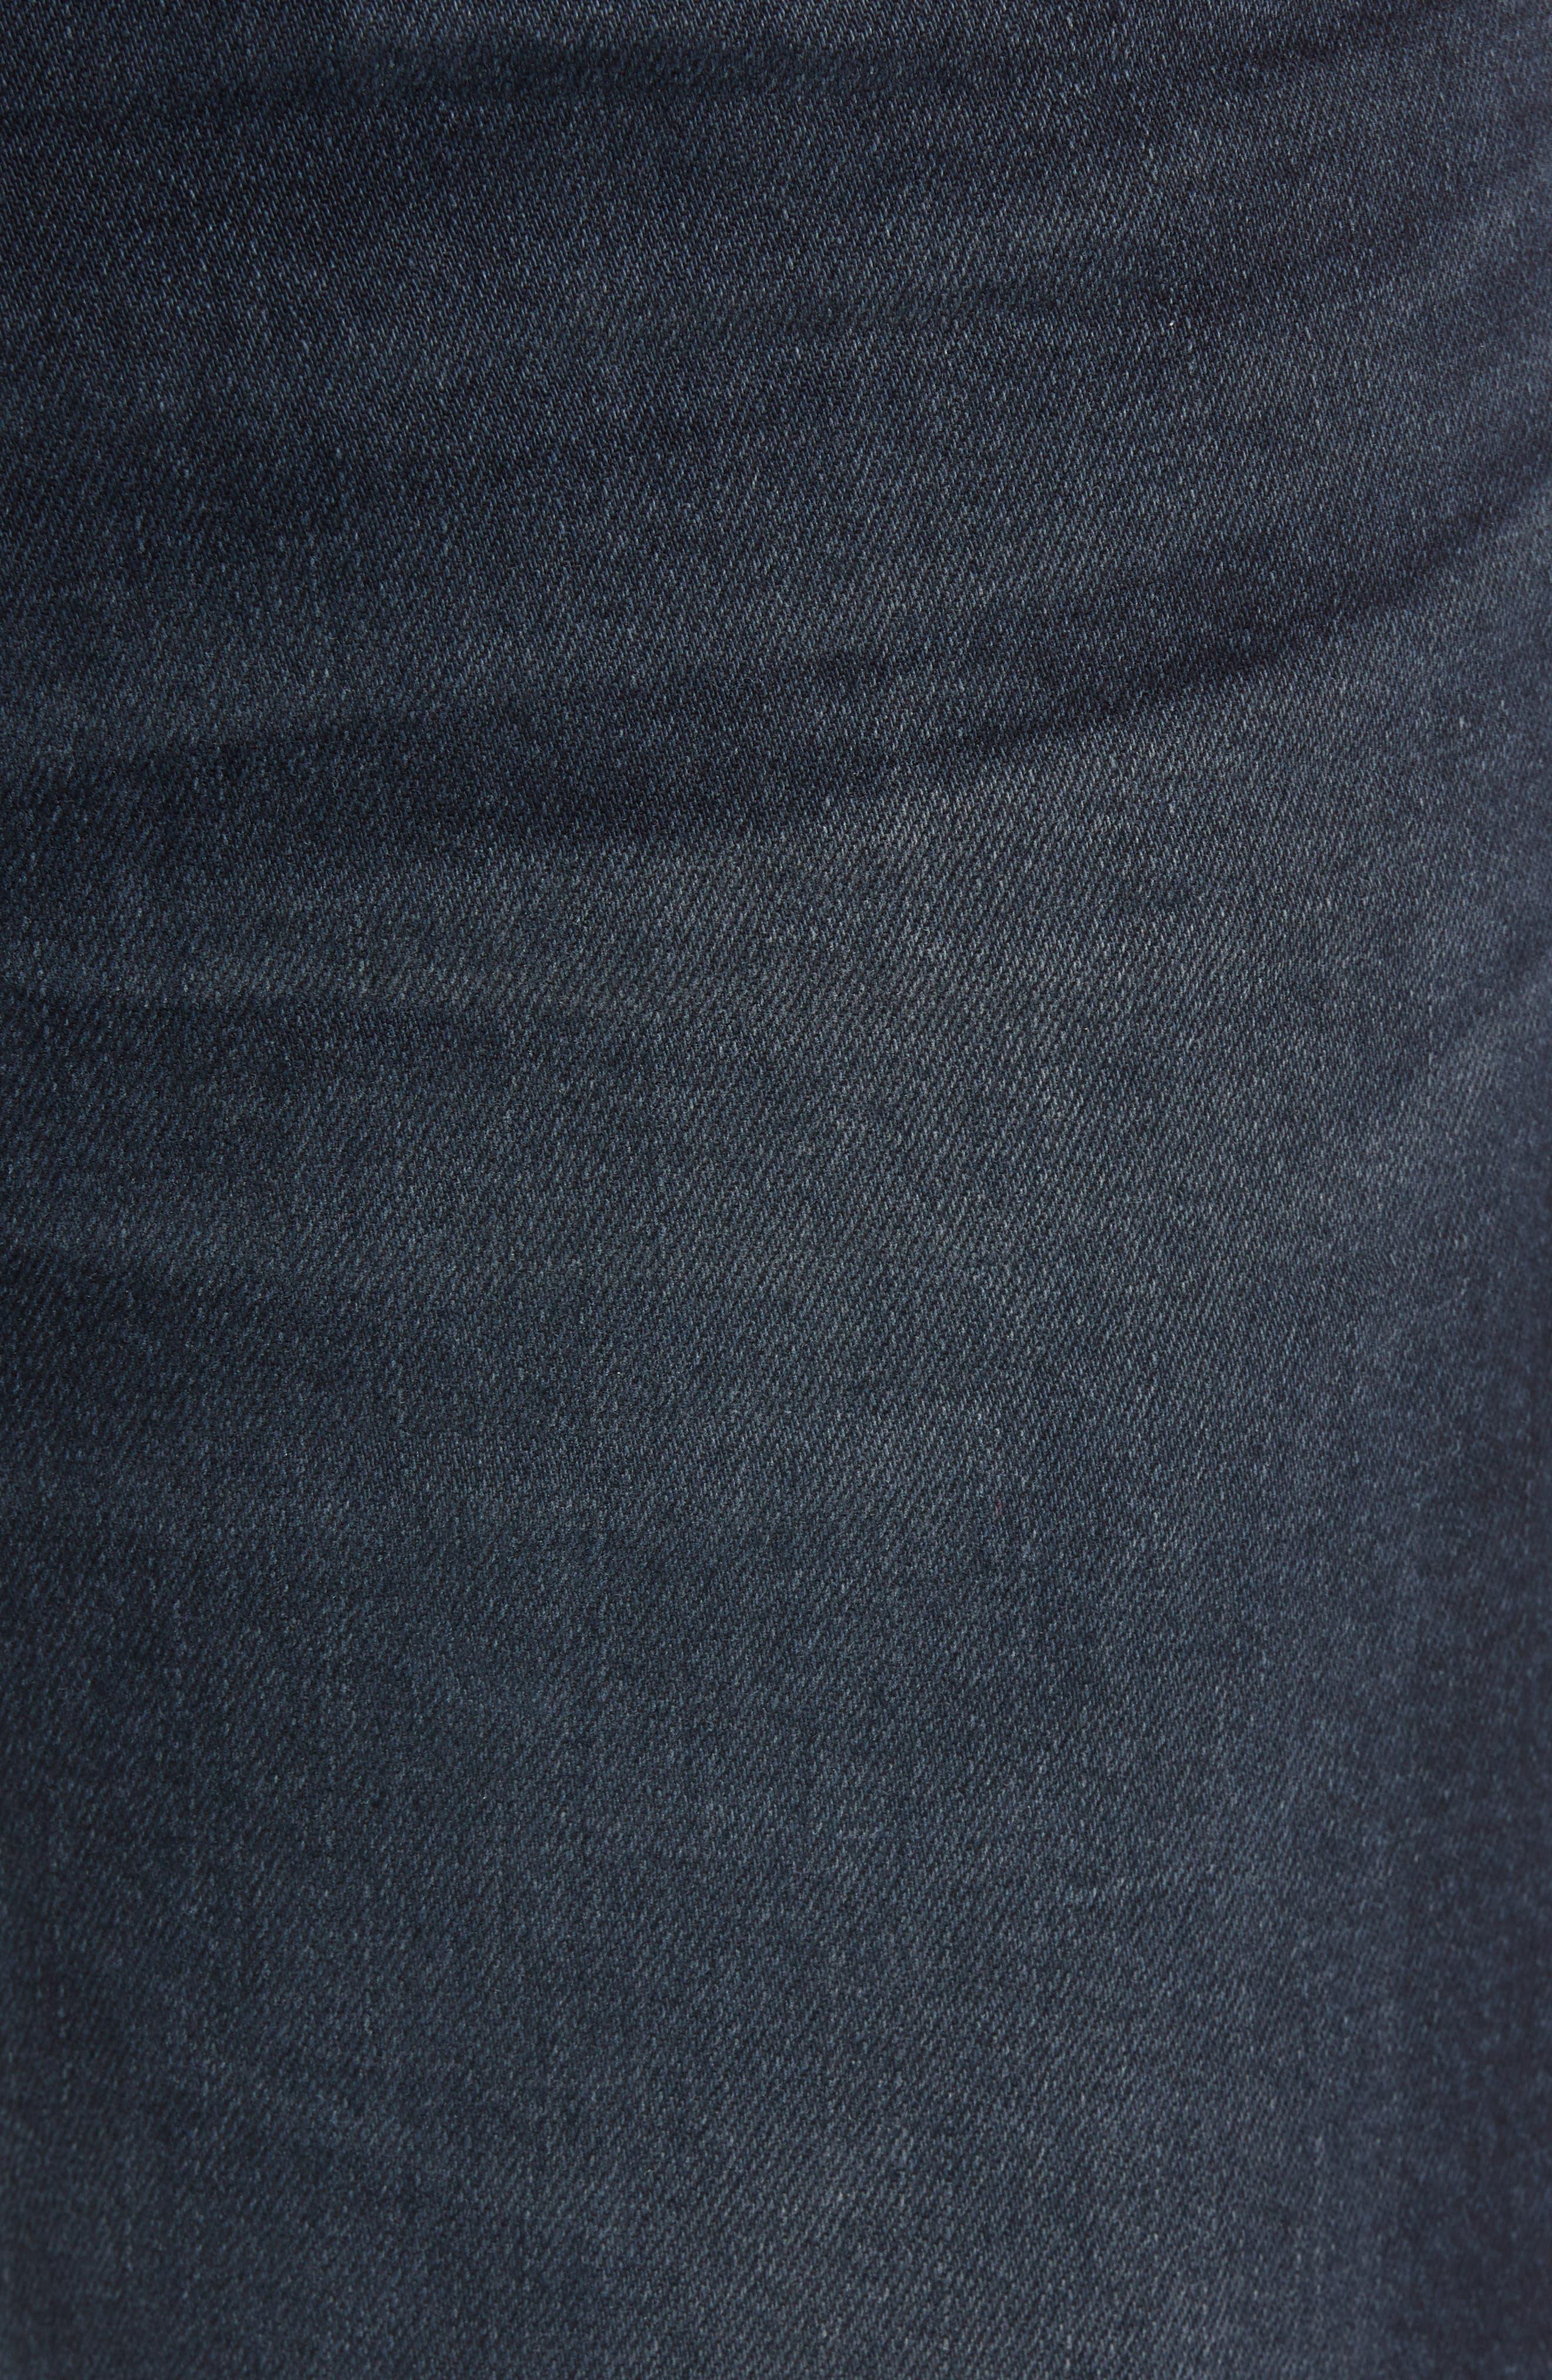 Tellis Slim Fit Jeans,                             Alternate thumbnail 5, color,                             2 YEARS RUMBLE